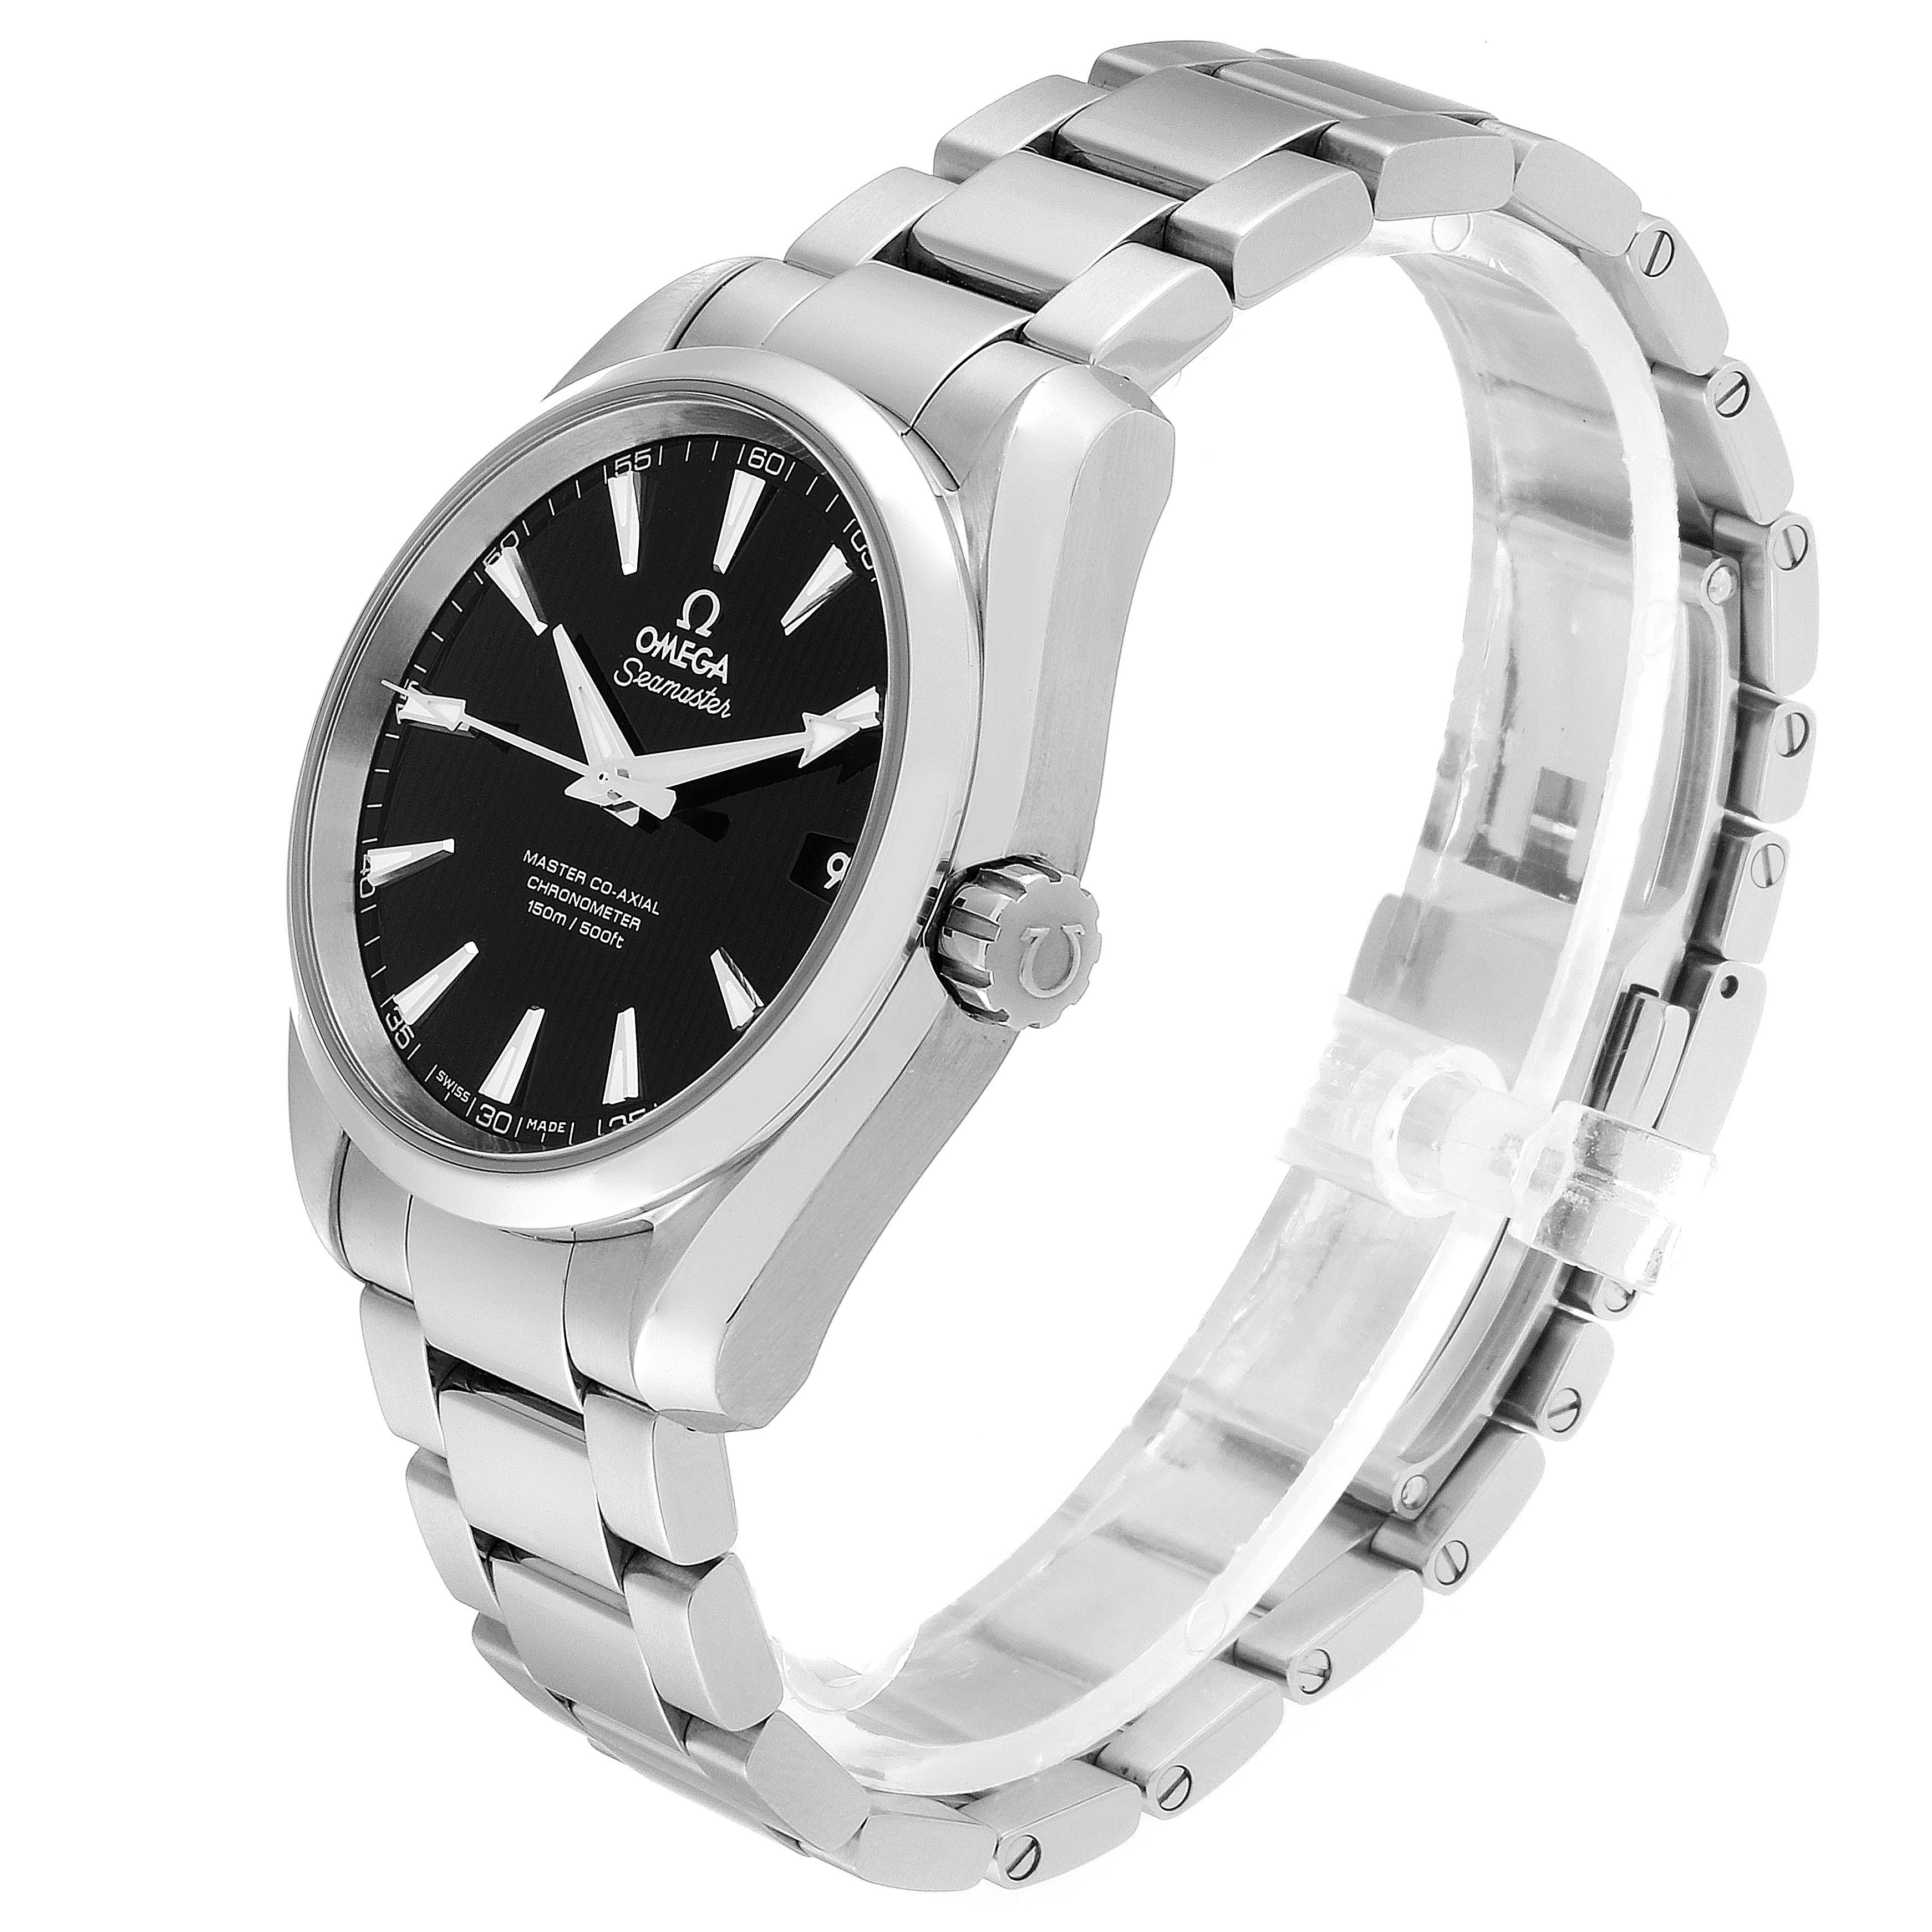 Omega Seamaster Aqua Terra Black Dial Watch 231.10.39.21.01.002 Box Card SwissWatchExpo